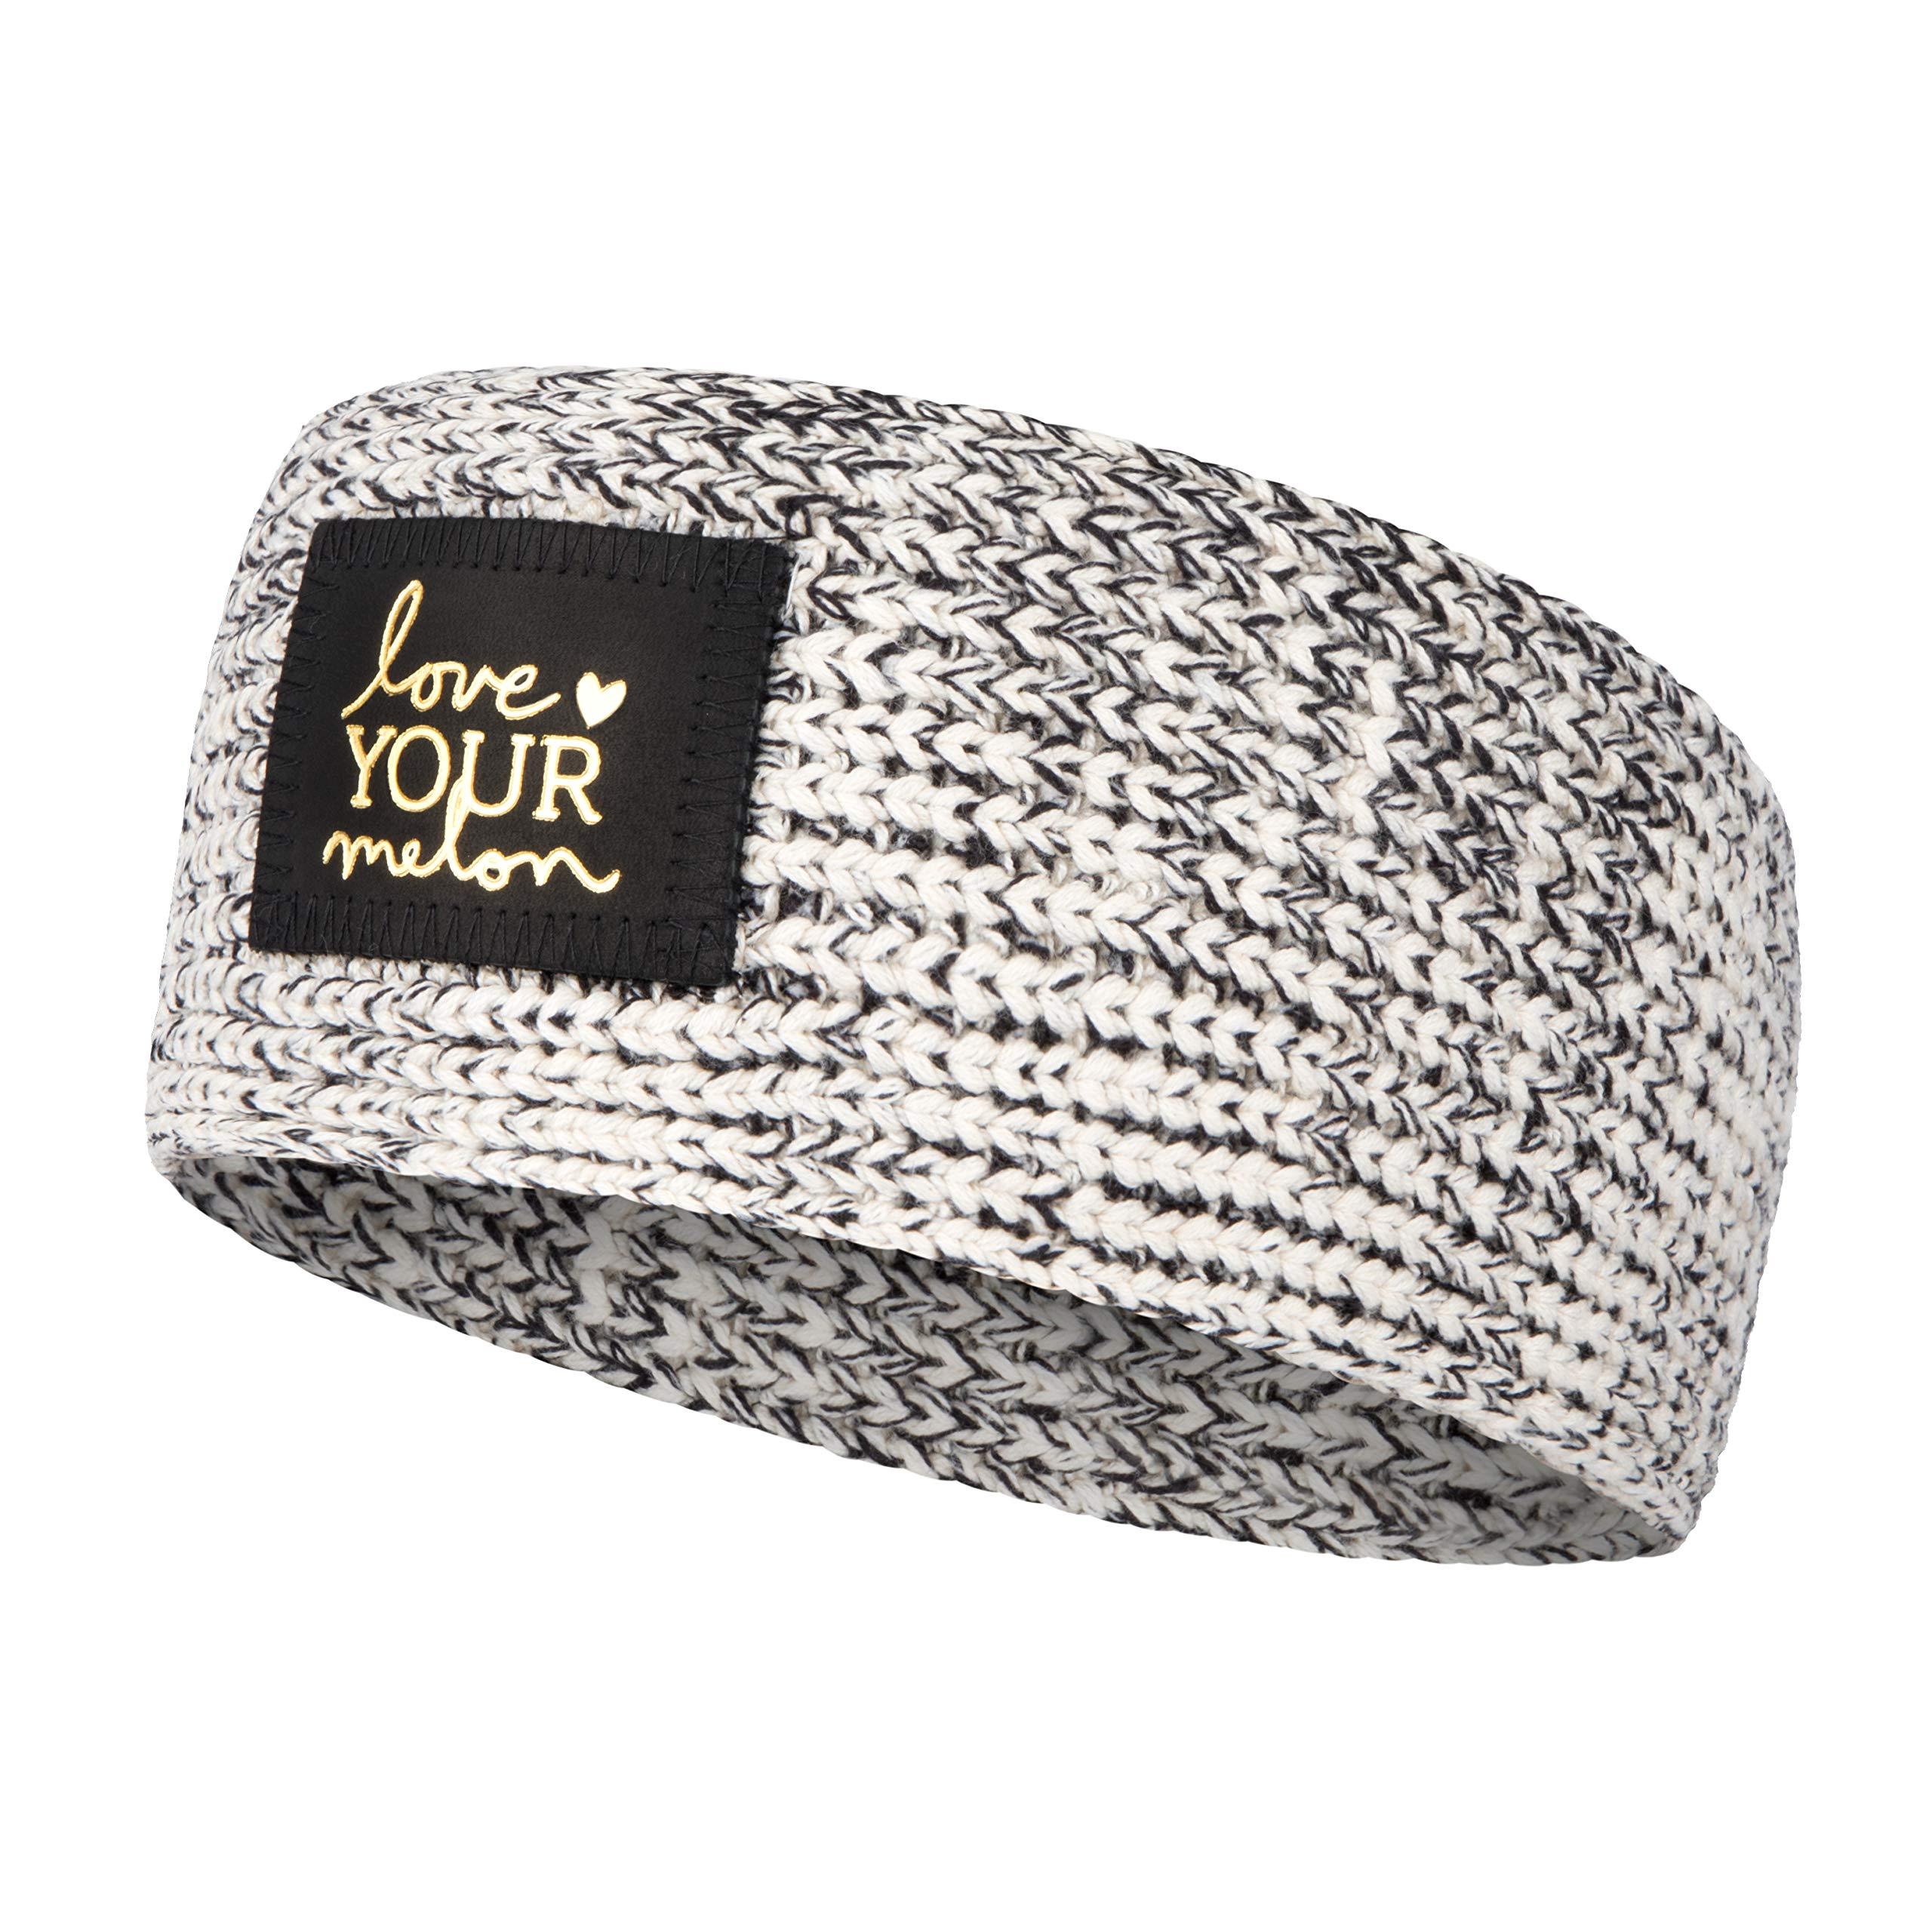 Black Speckled Gold Foil Knit Headband